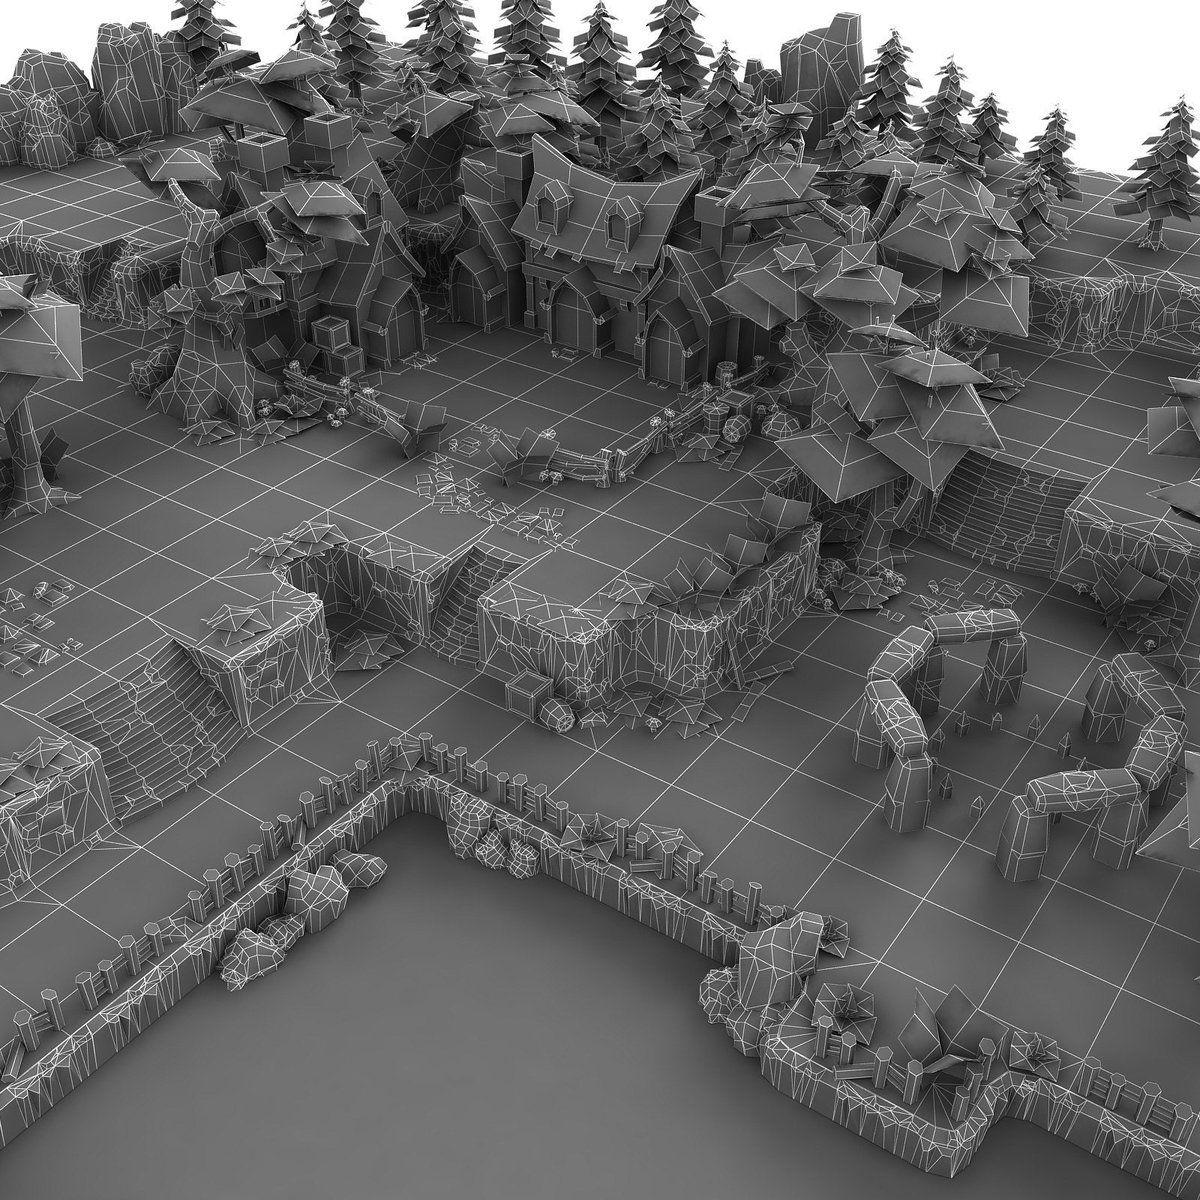 Fantasy Level Set Game level design, Low poly